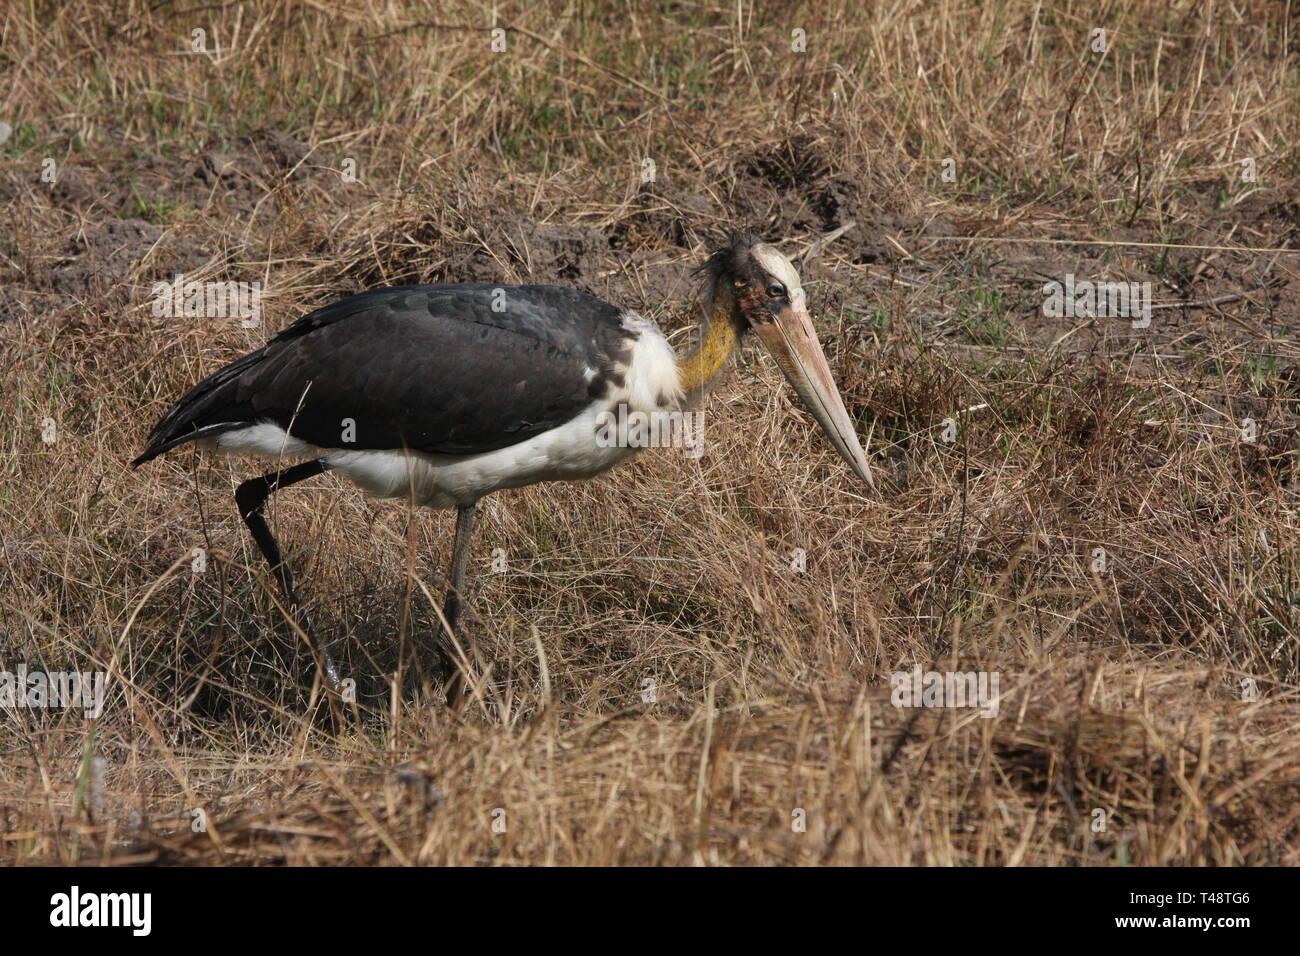 Lesser Adjutant Stork, Bandhavgarh National Park, Madhya Pradesh - Stock Image